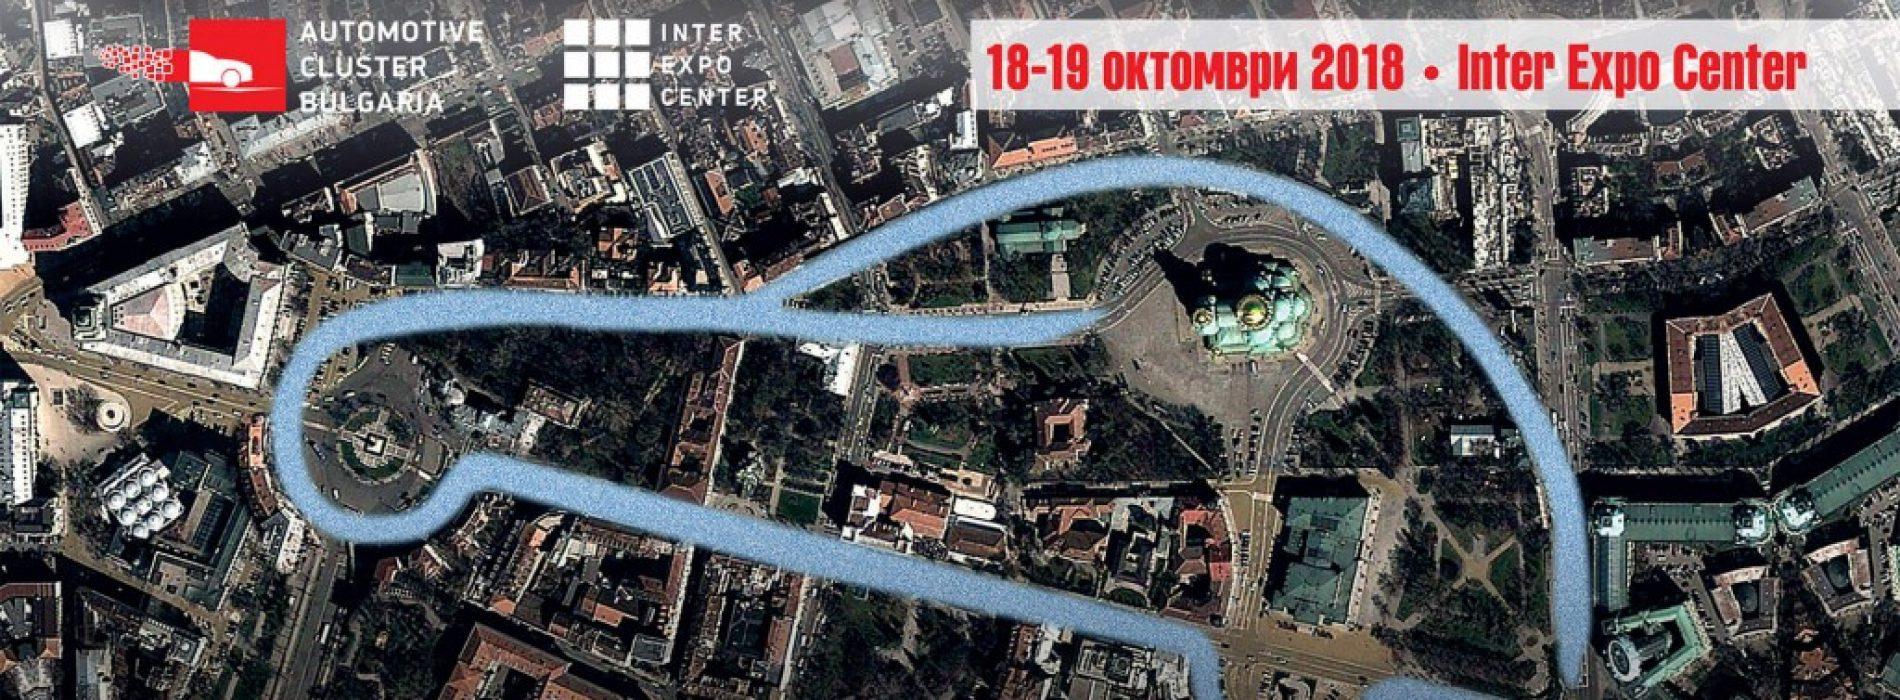 Automotive Forum & Expo 2018 събира световният аутомотив елит в София